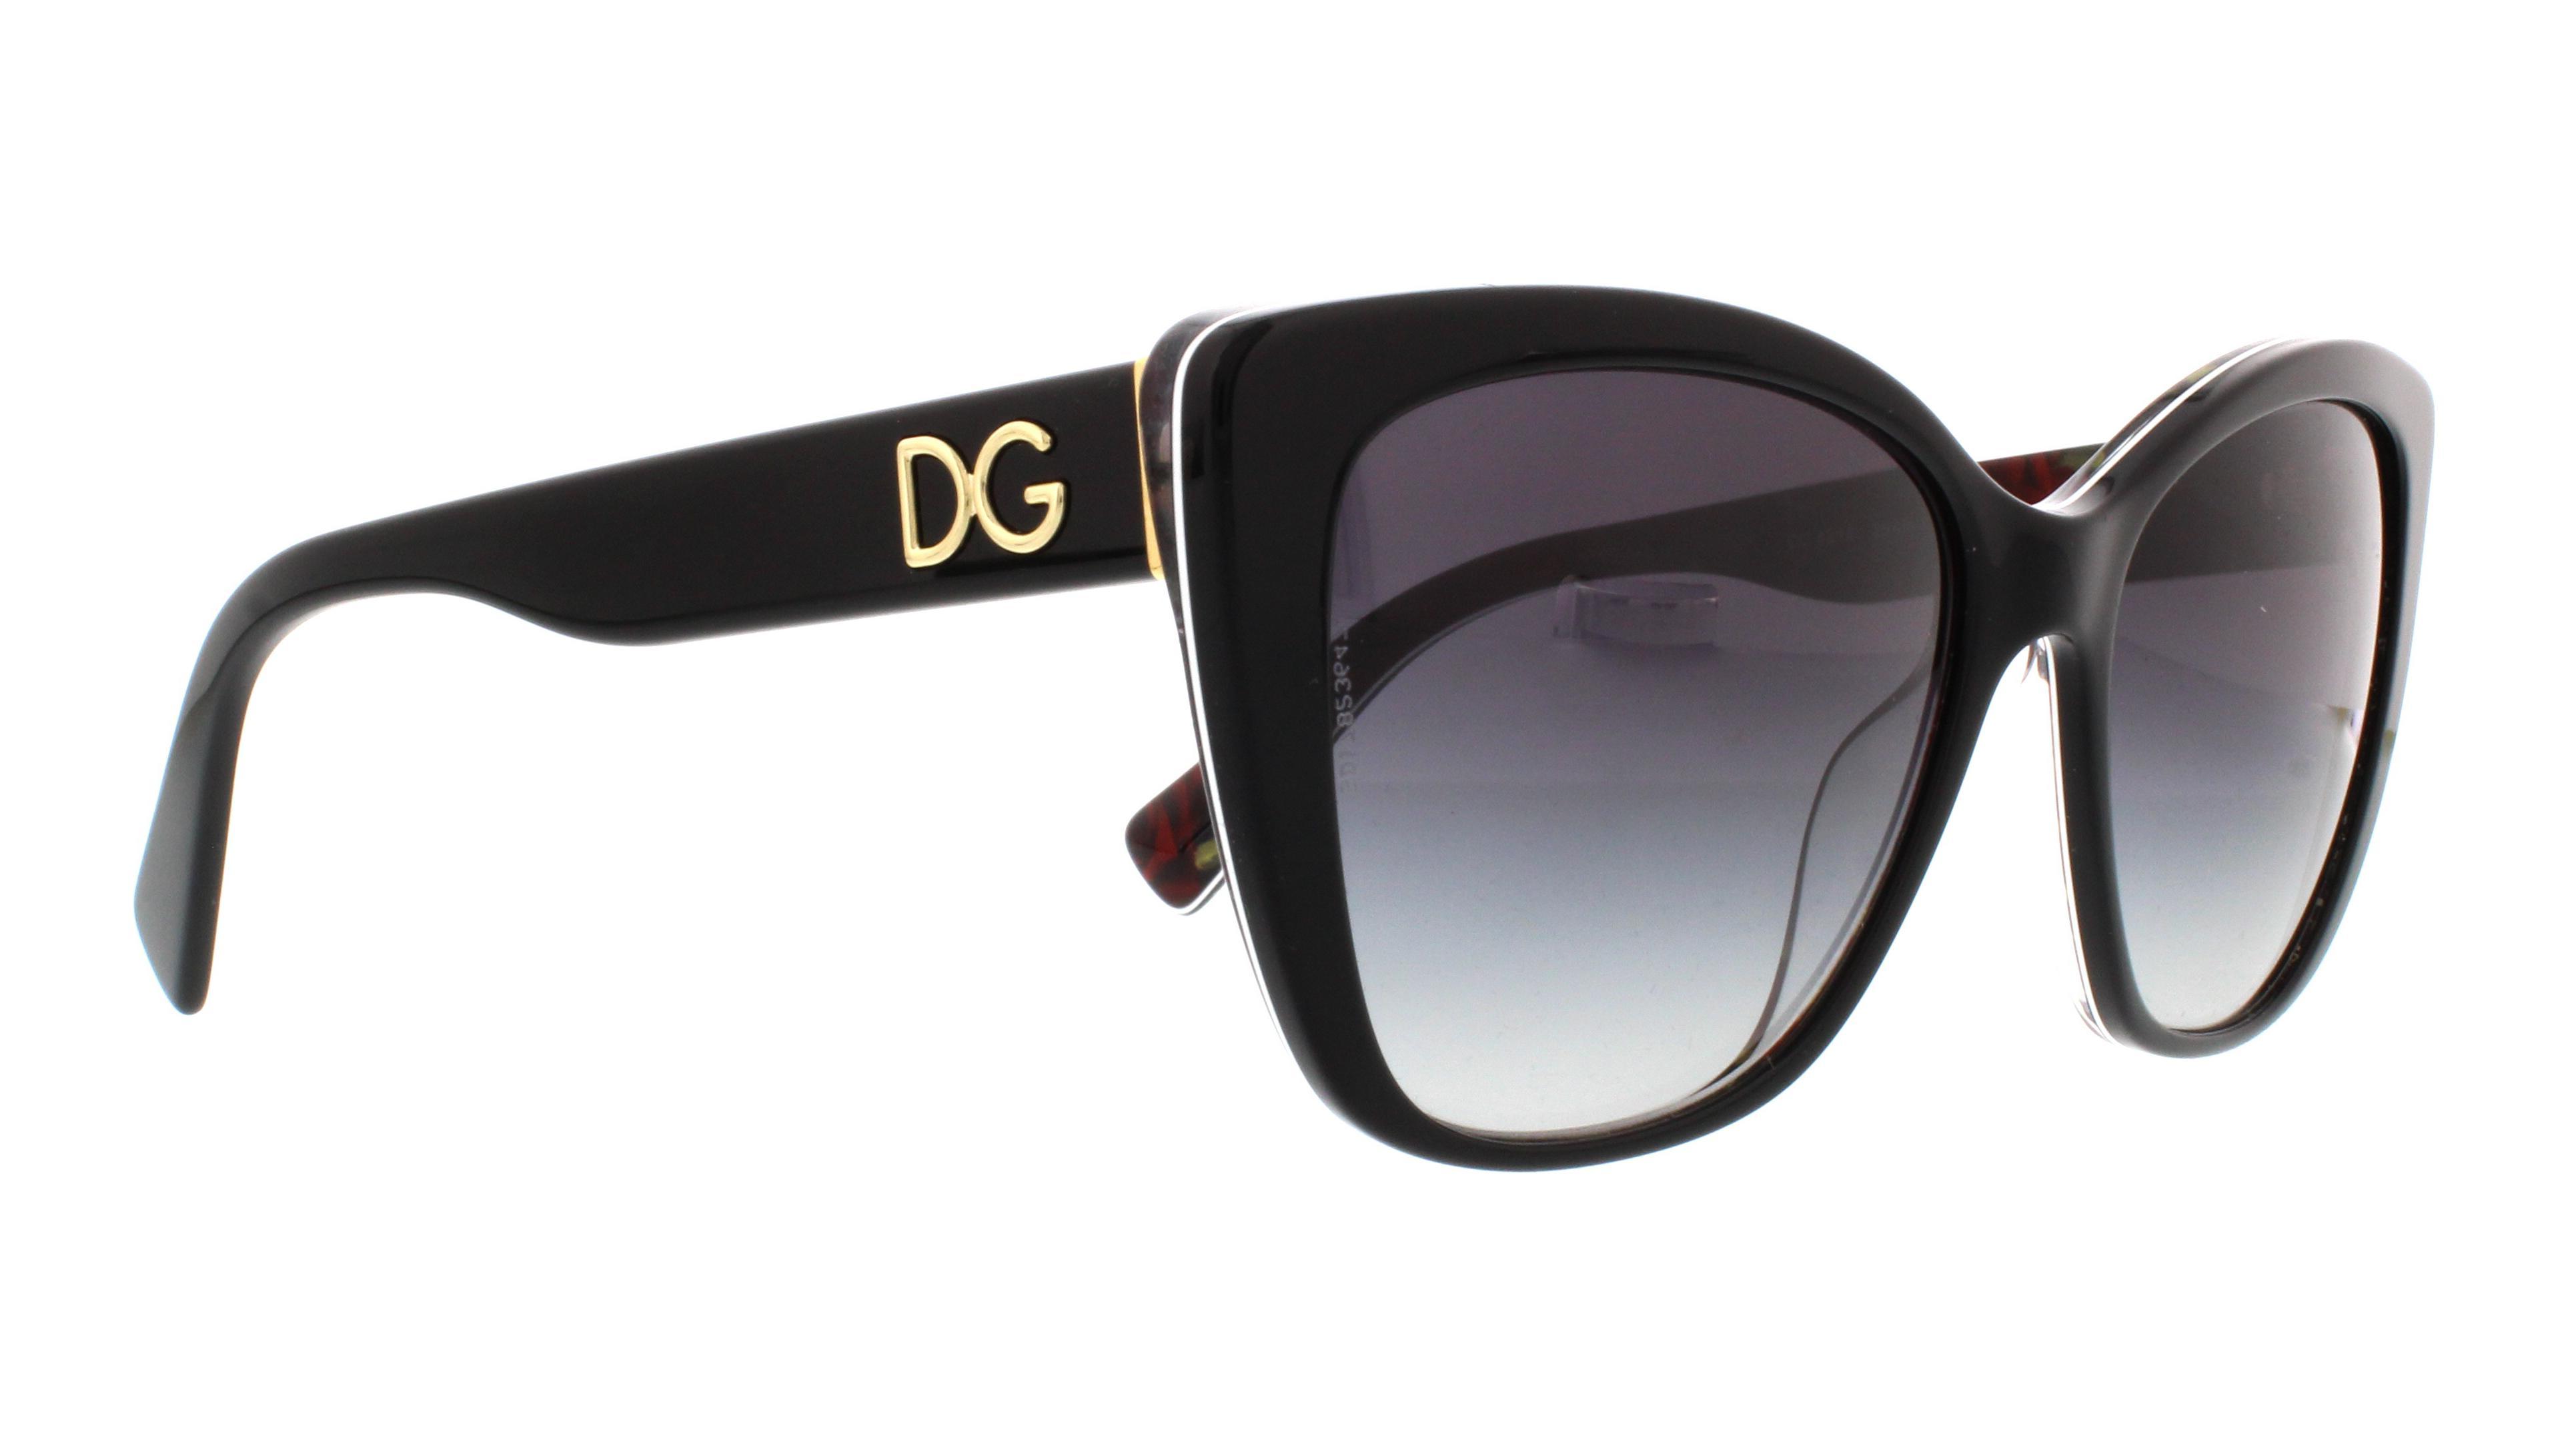 dolce gabbana sunglasses dg4216 29408g black on printing roses 55mm - Dolce And Gabbana Frames